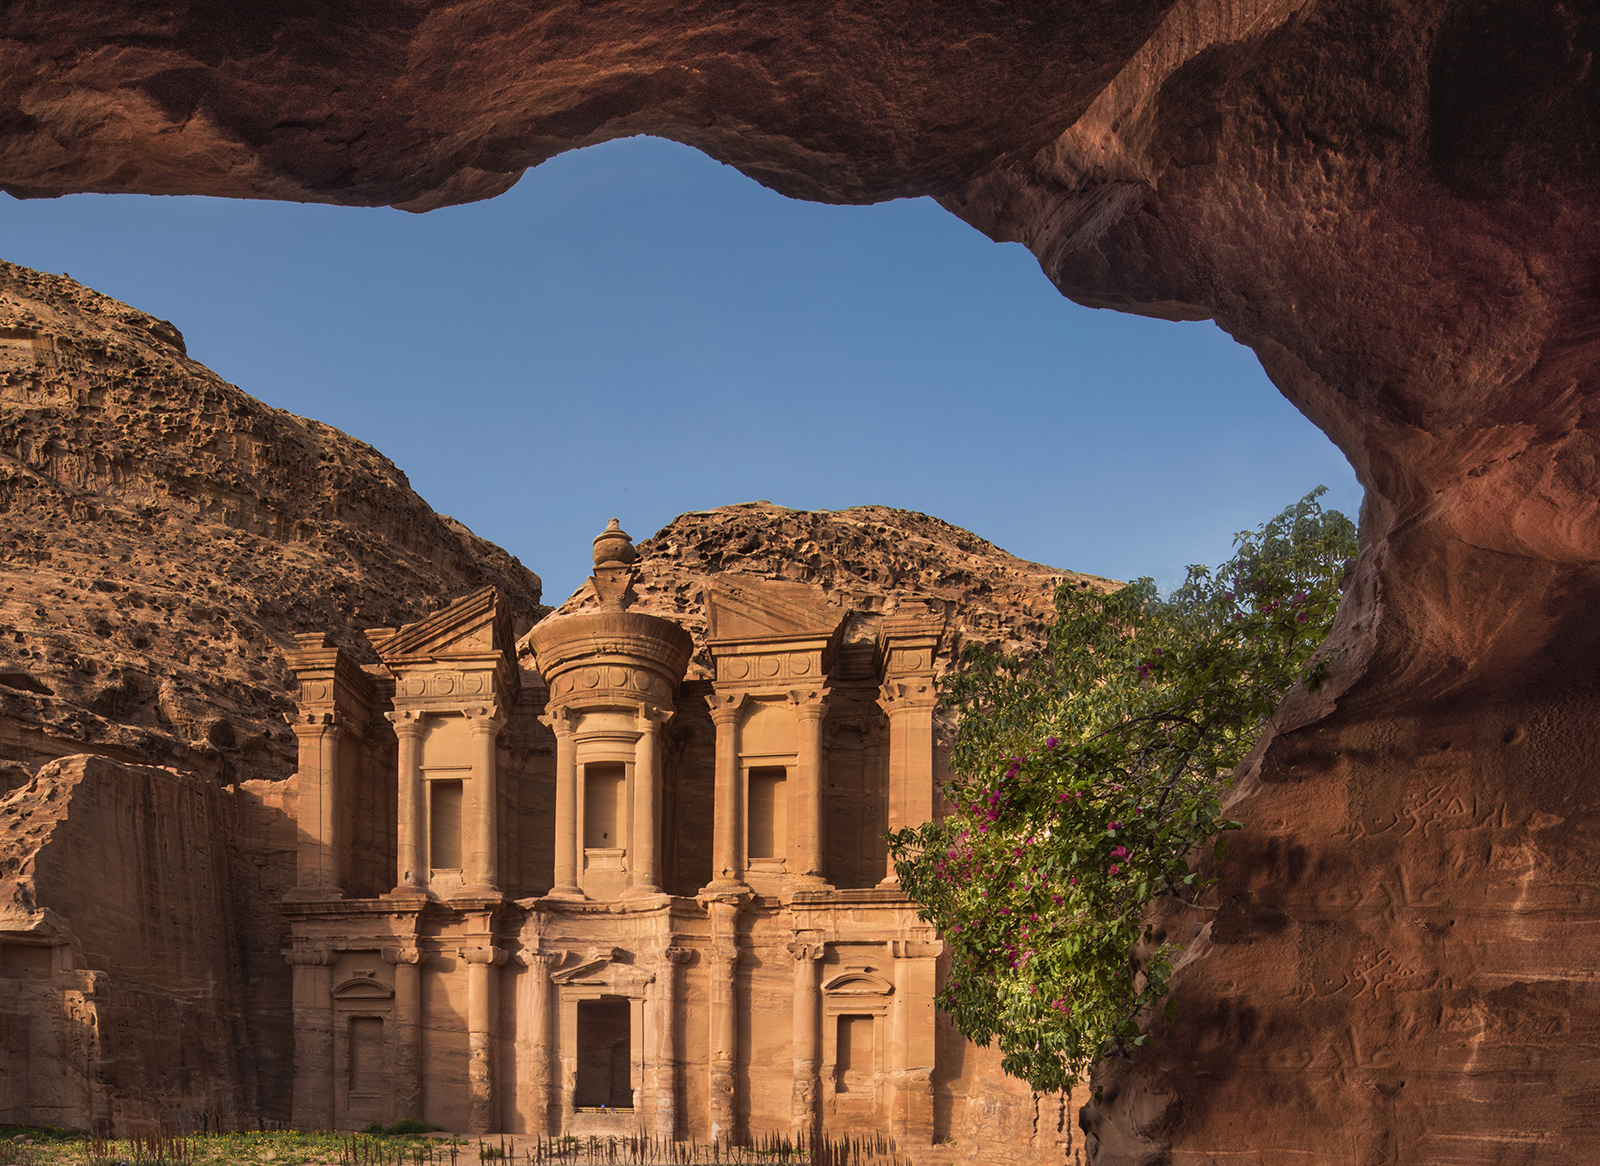 Monastery framing